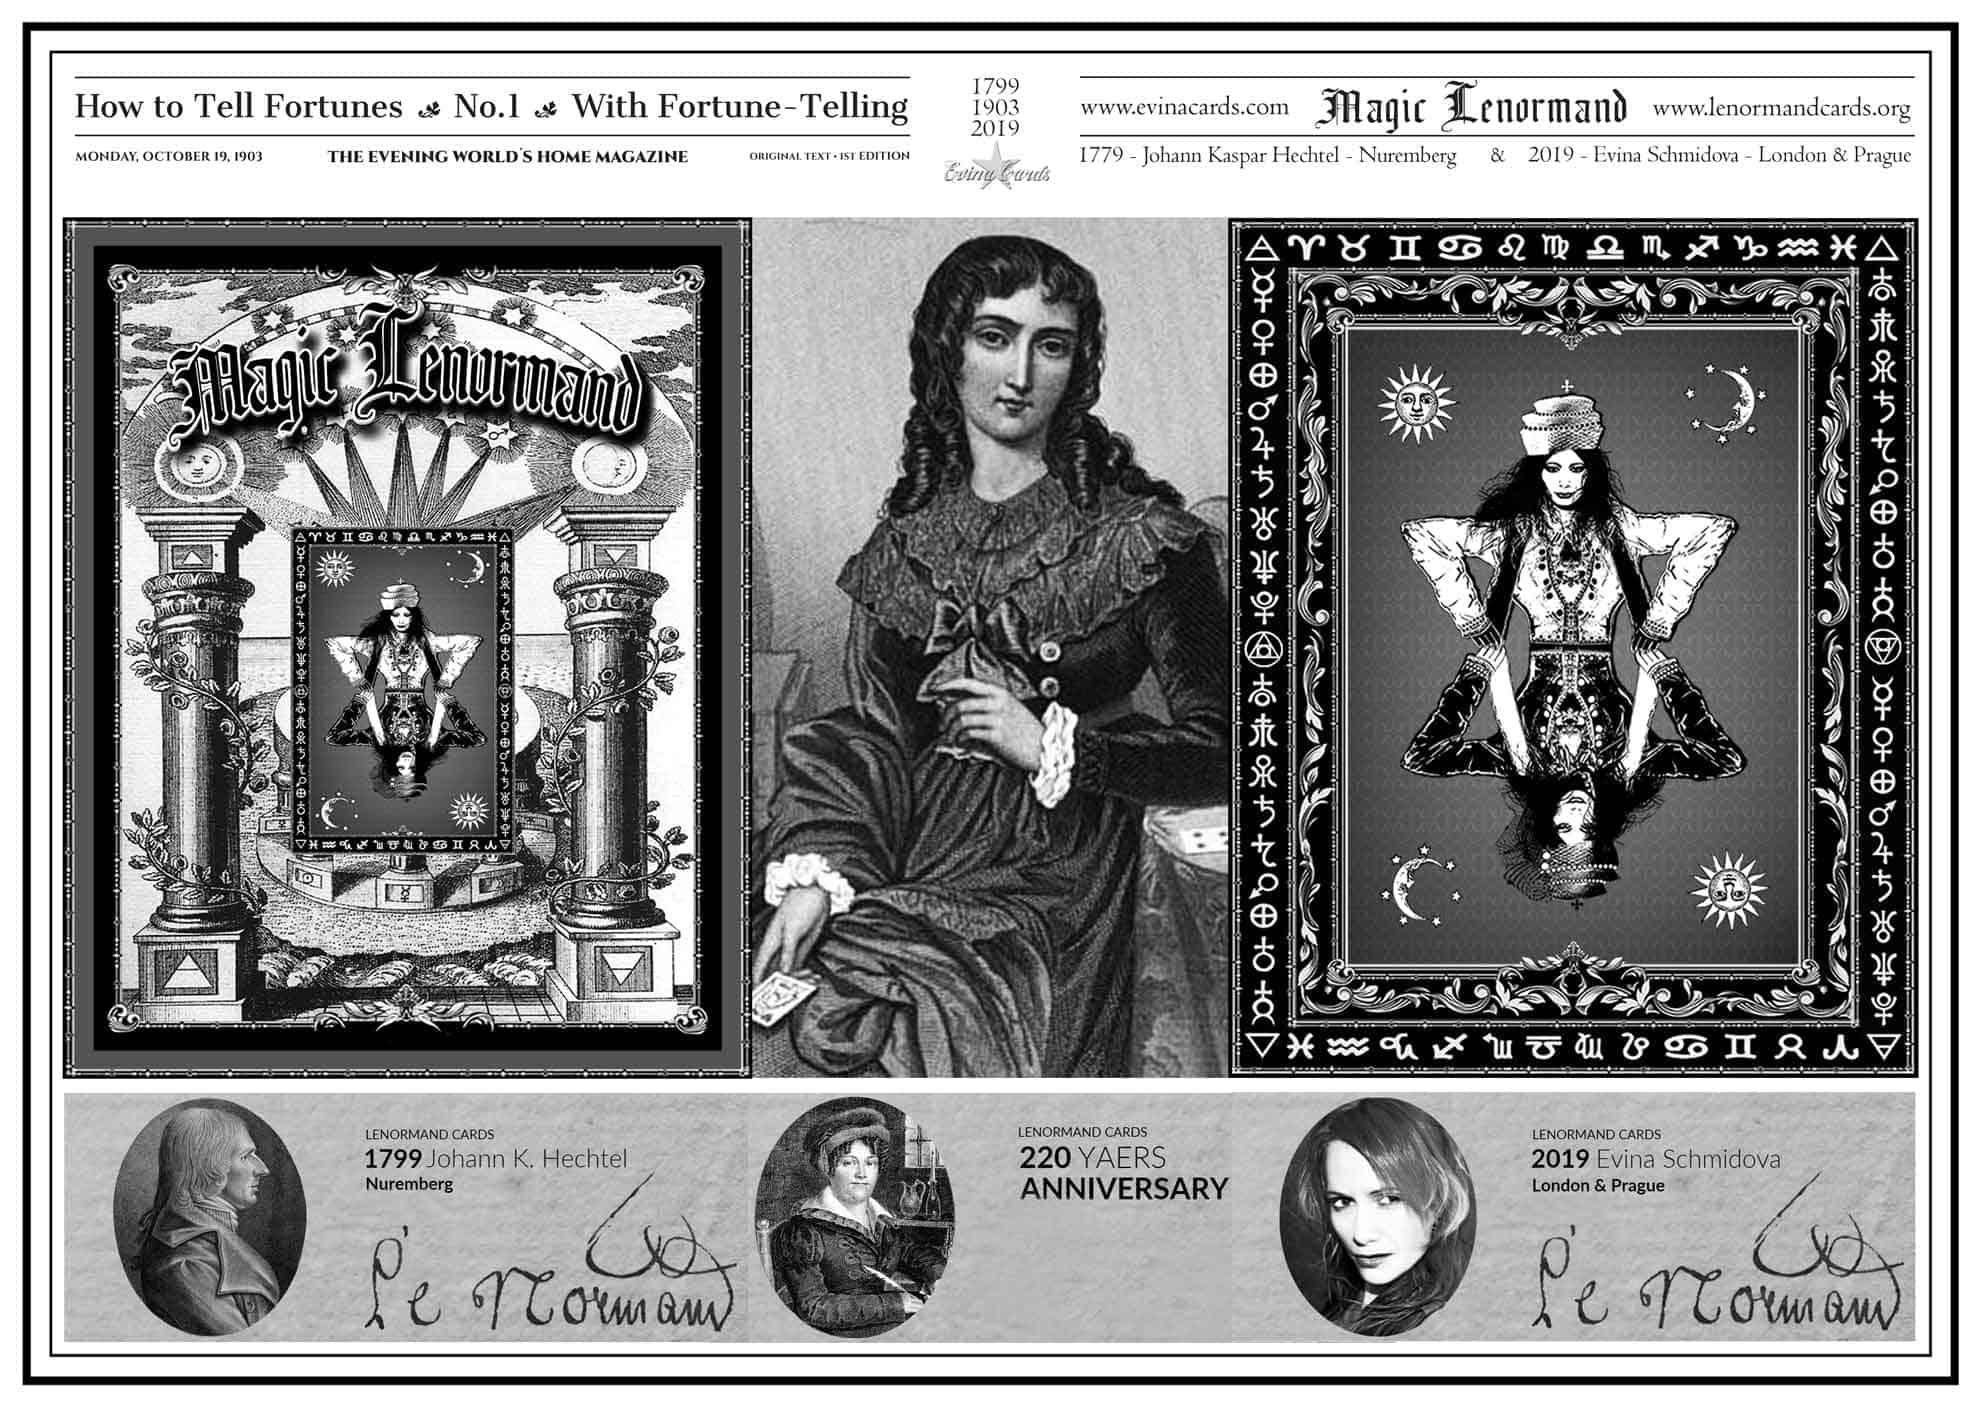 Magic-Lenormand-Cards-1799-1903-2019-backside